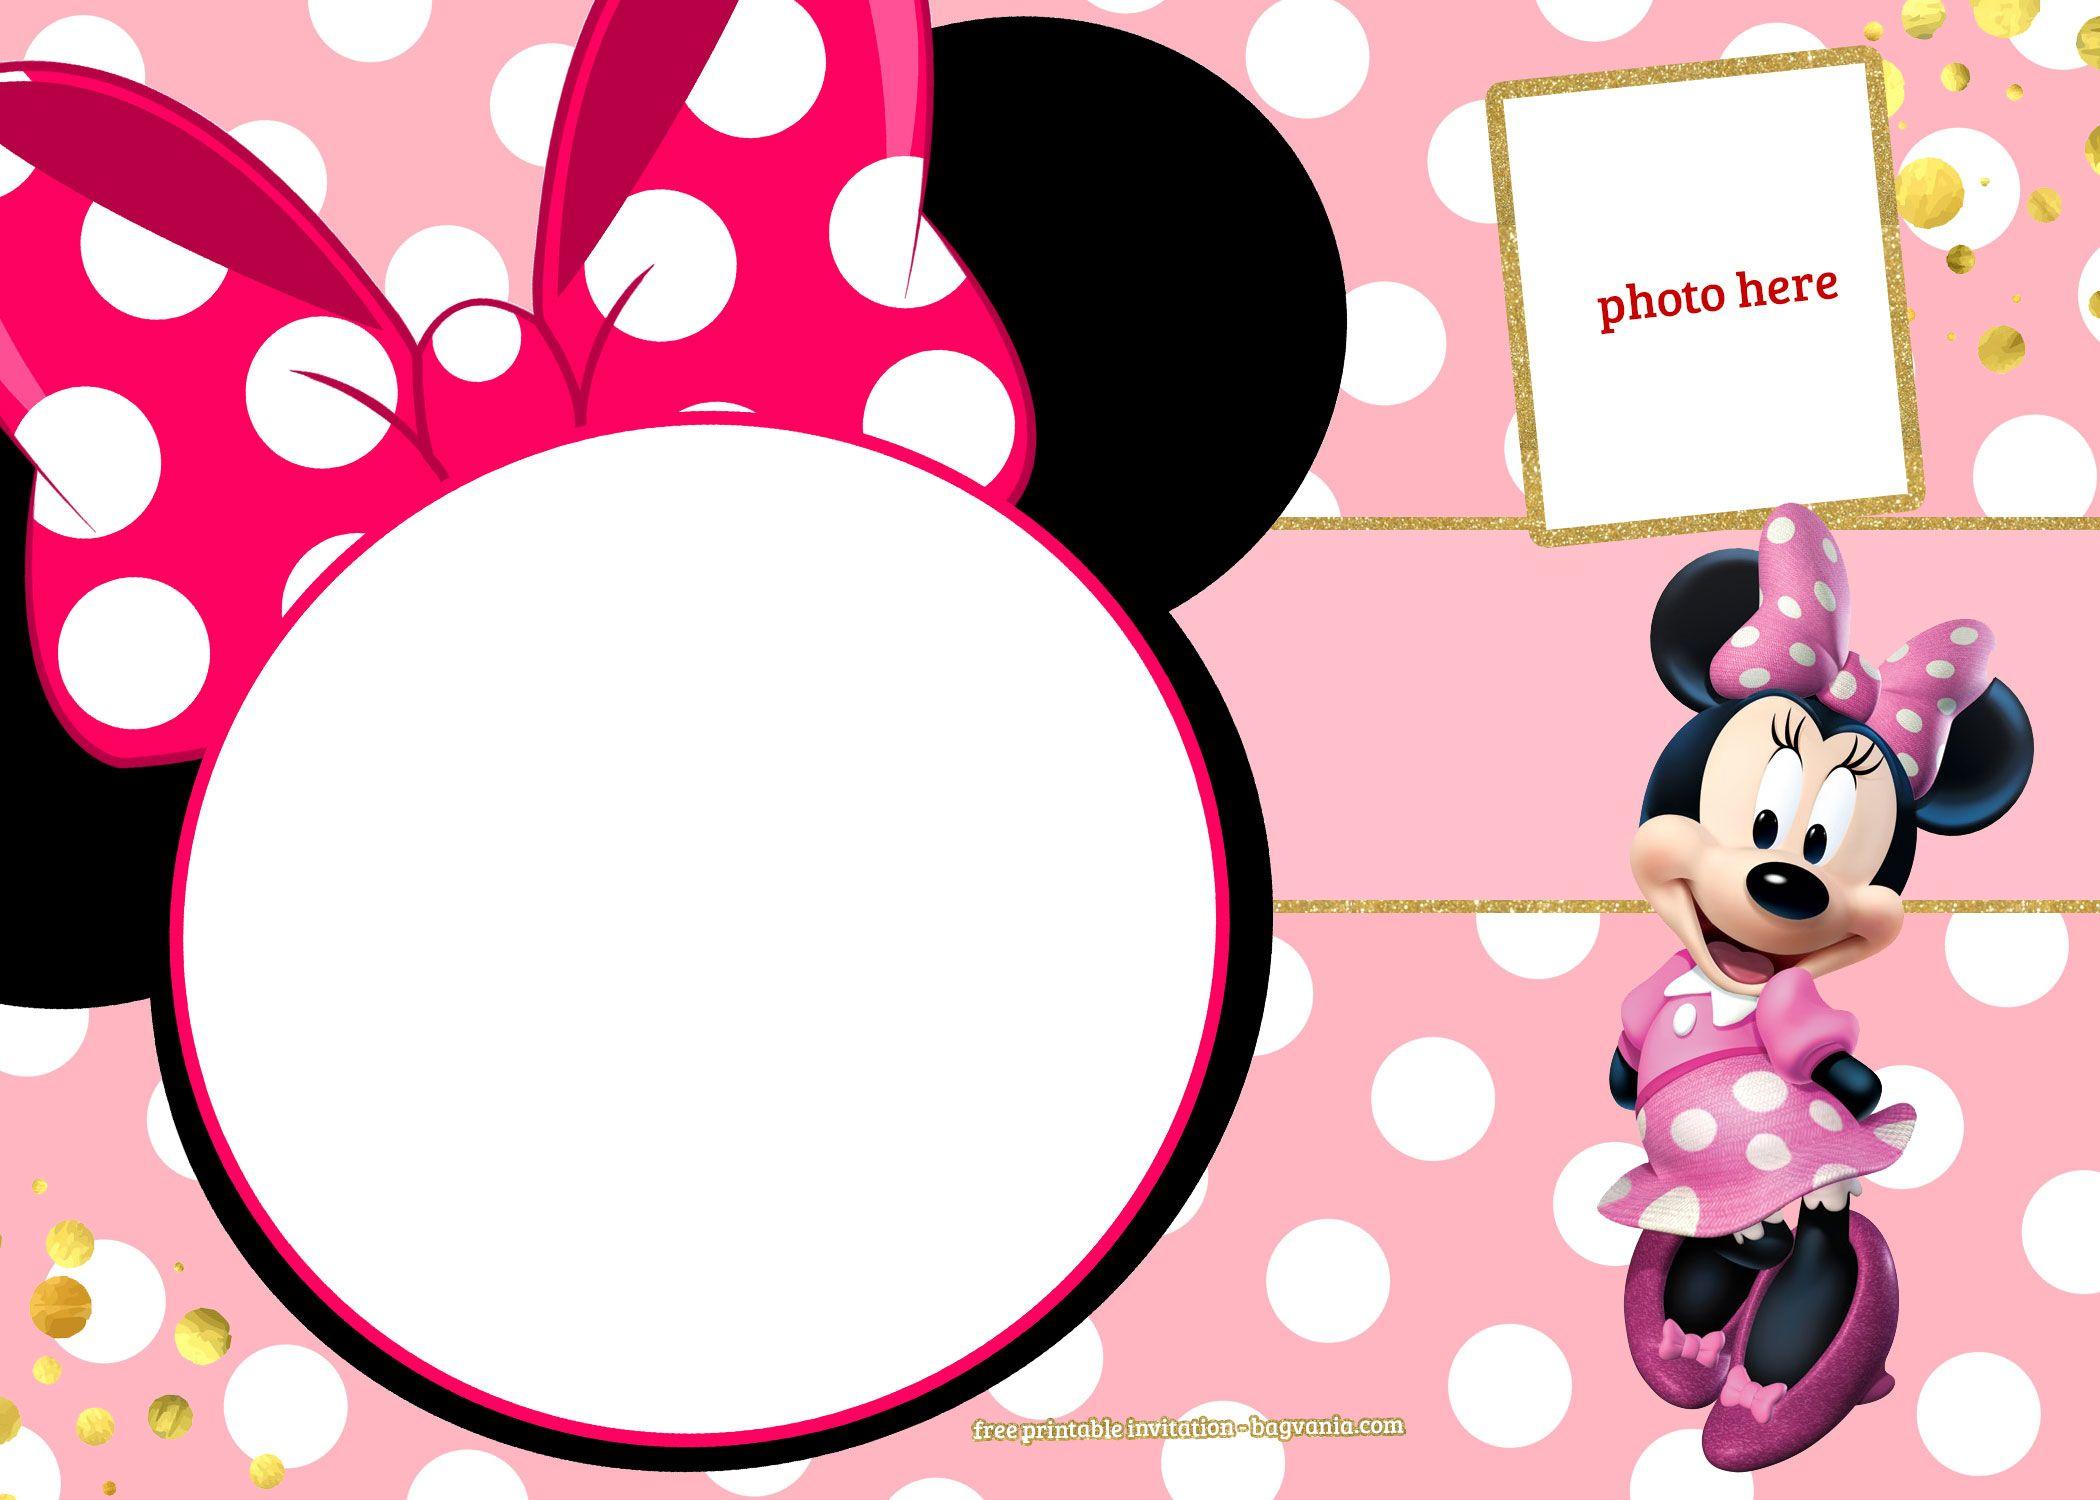 Free Printable Minnie Mouse Pinky Birthday Invitation | Design - Free Minnie Mouse Printable Templates